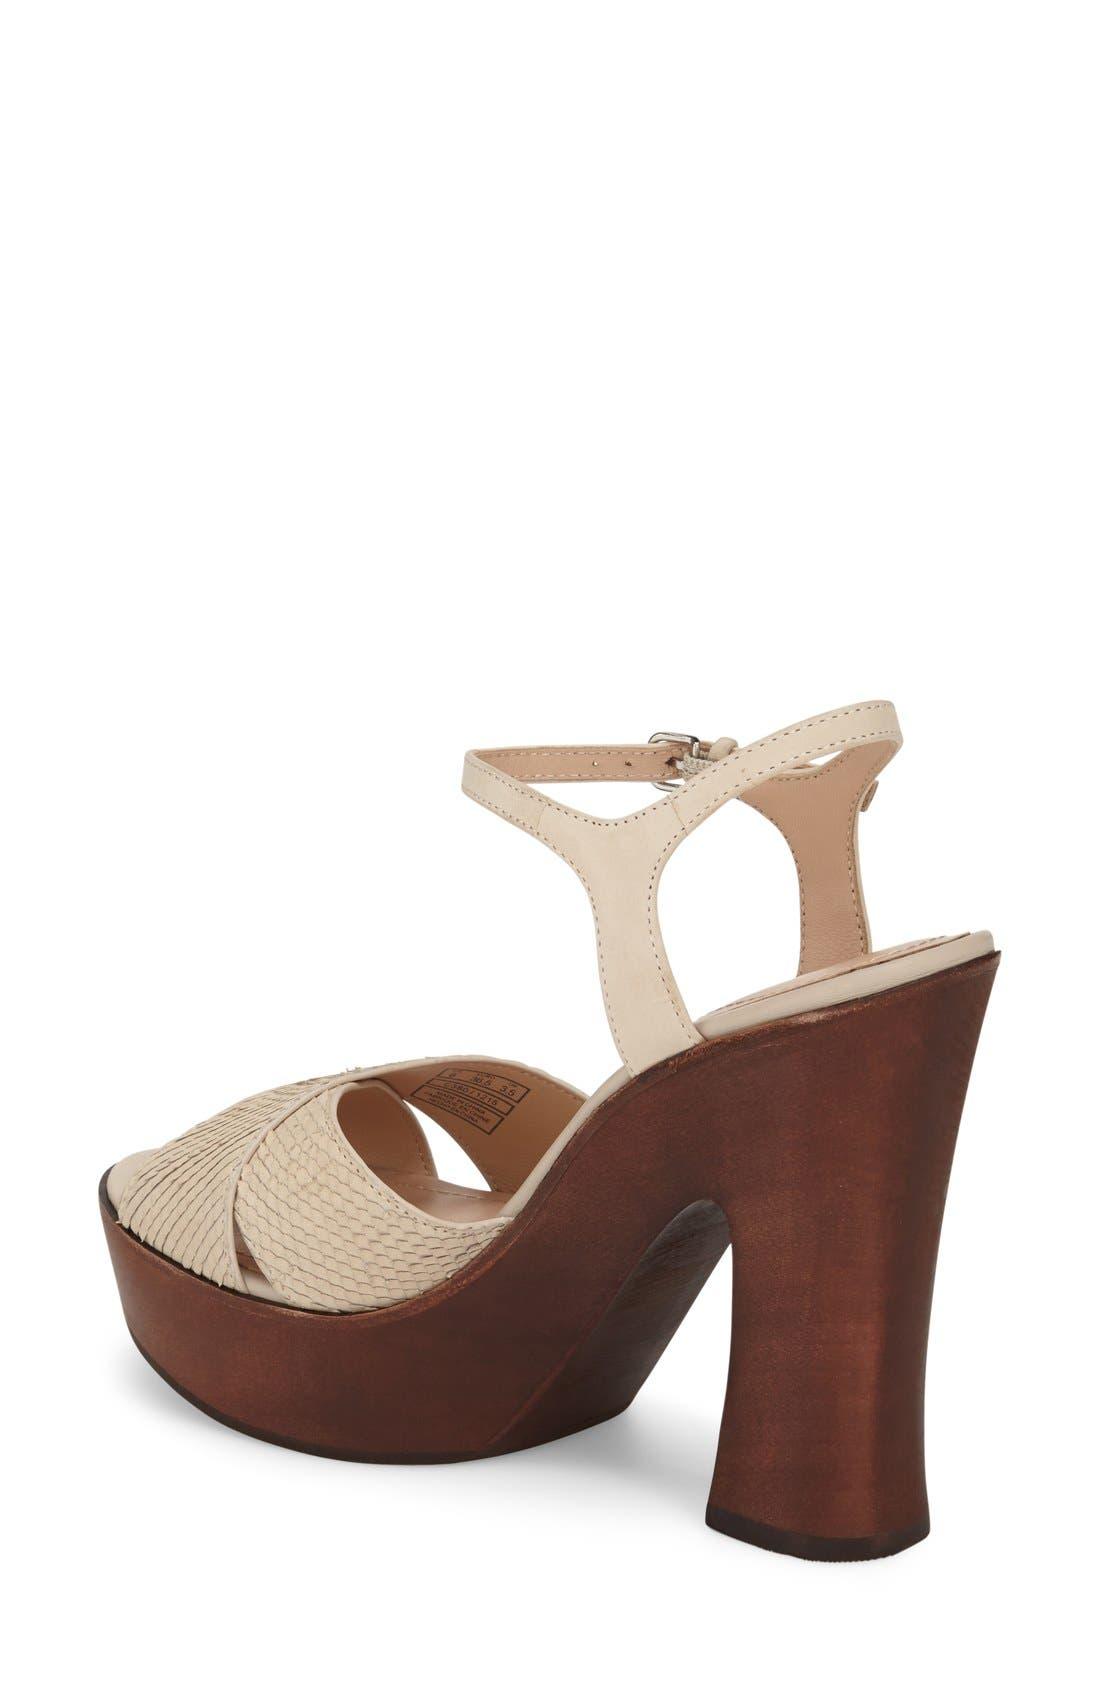 'Dakota' Platform Sandal,                             Alternate thumbnail 2, color,                             Bone Leather